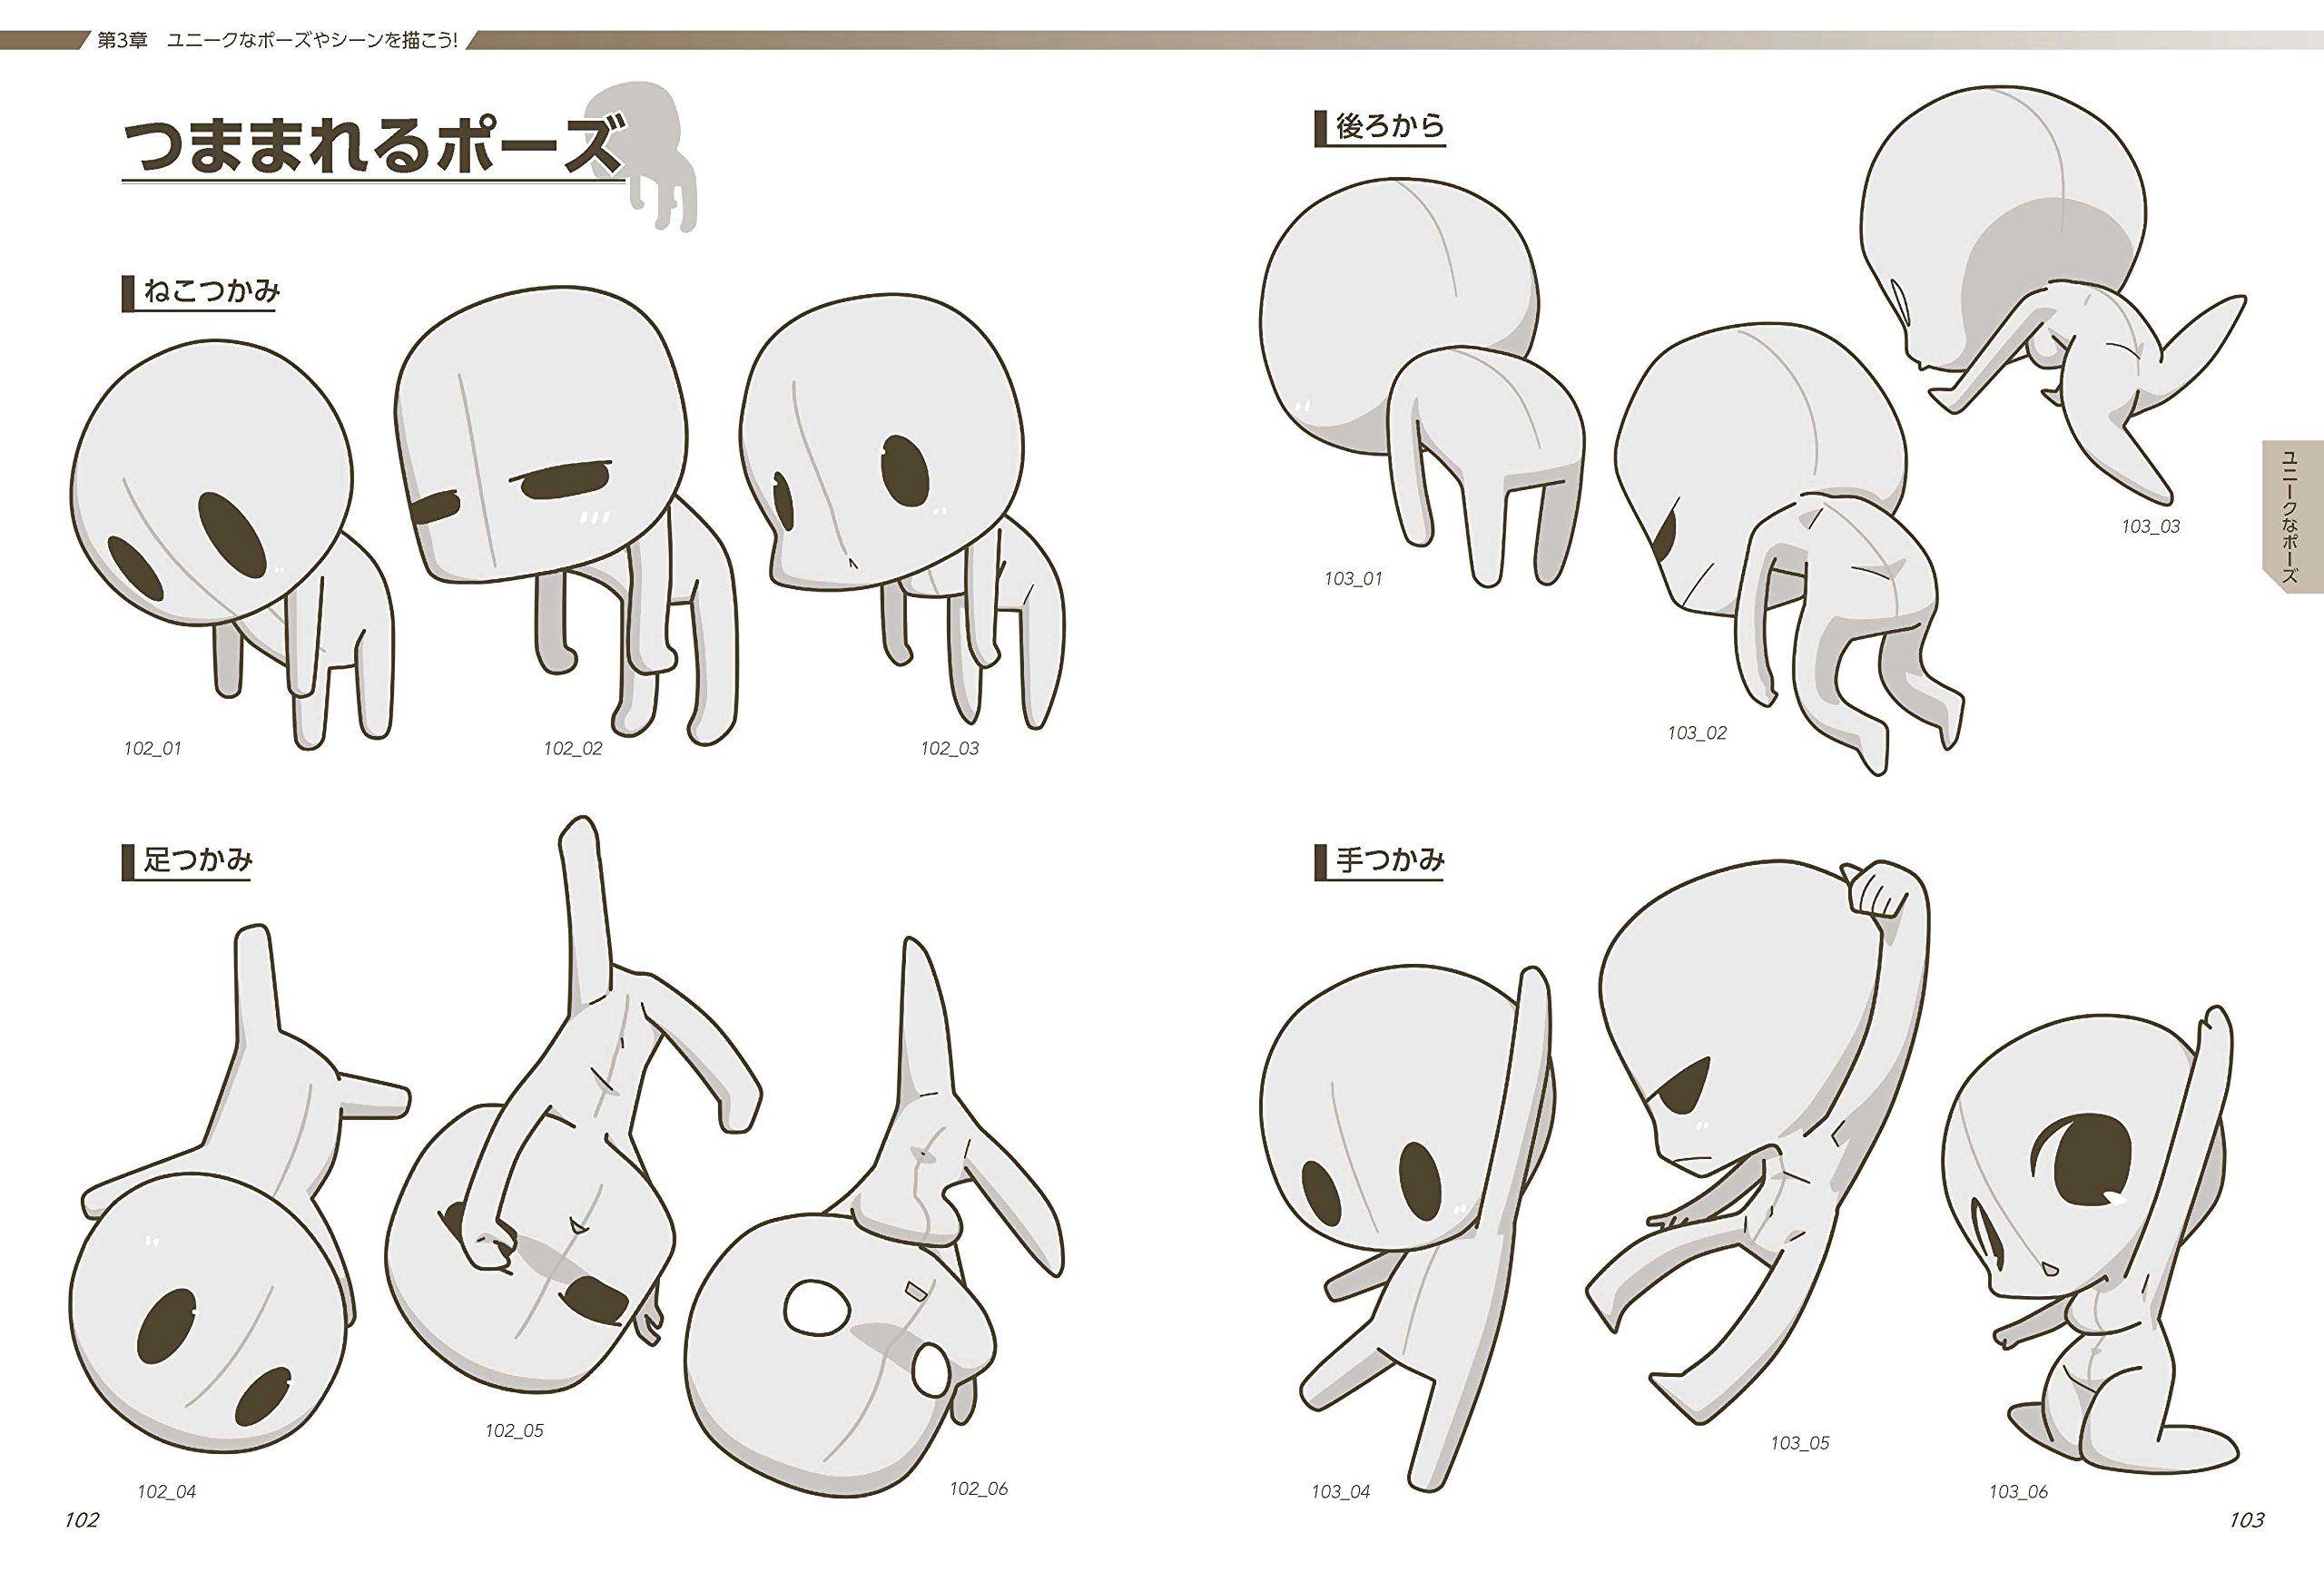 Dibujo Posturas Chibi Ref Dibujos Como Dibujar Dibujo